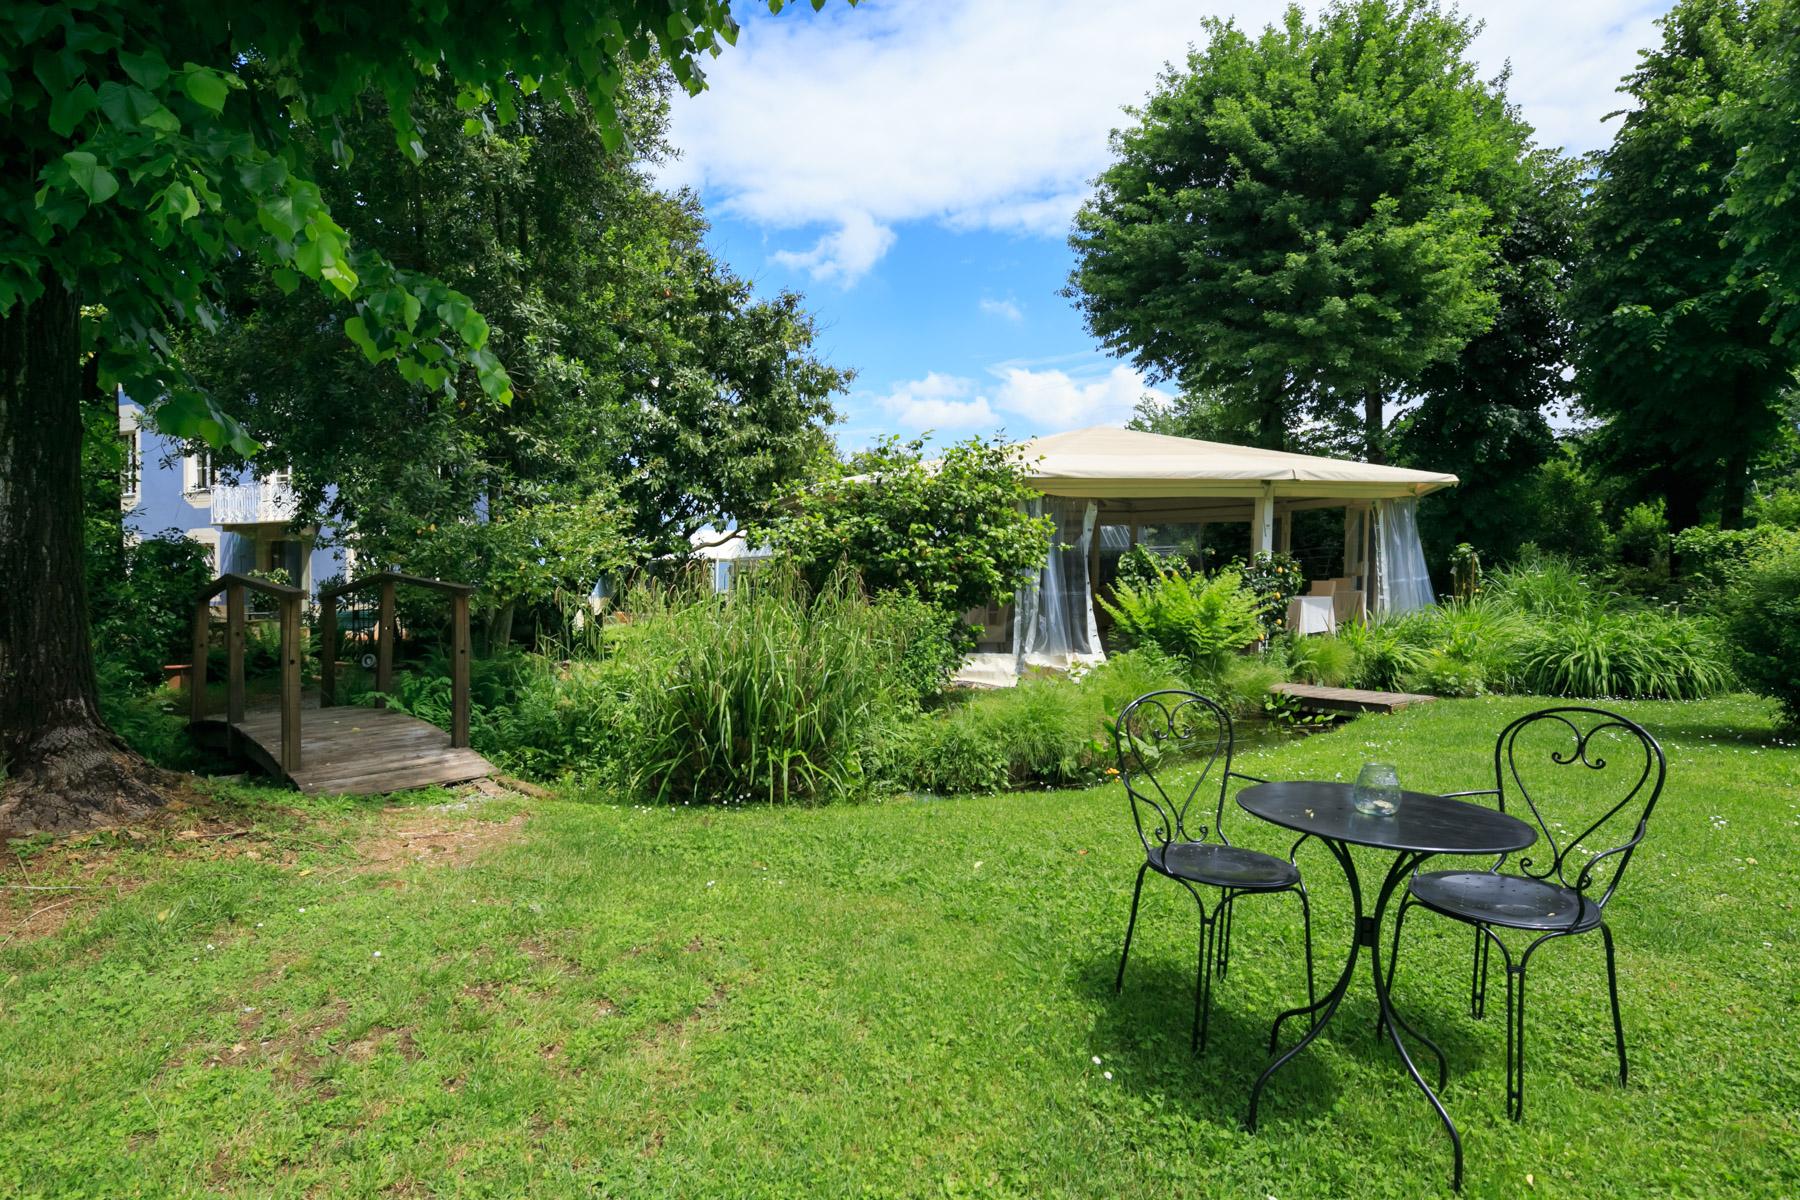 Villa in Vendita a Lucca: 5 locali, 700 mq - Foto 14